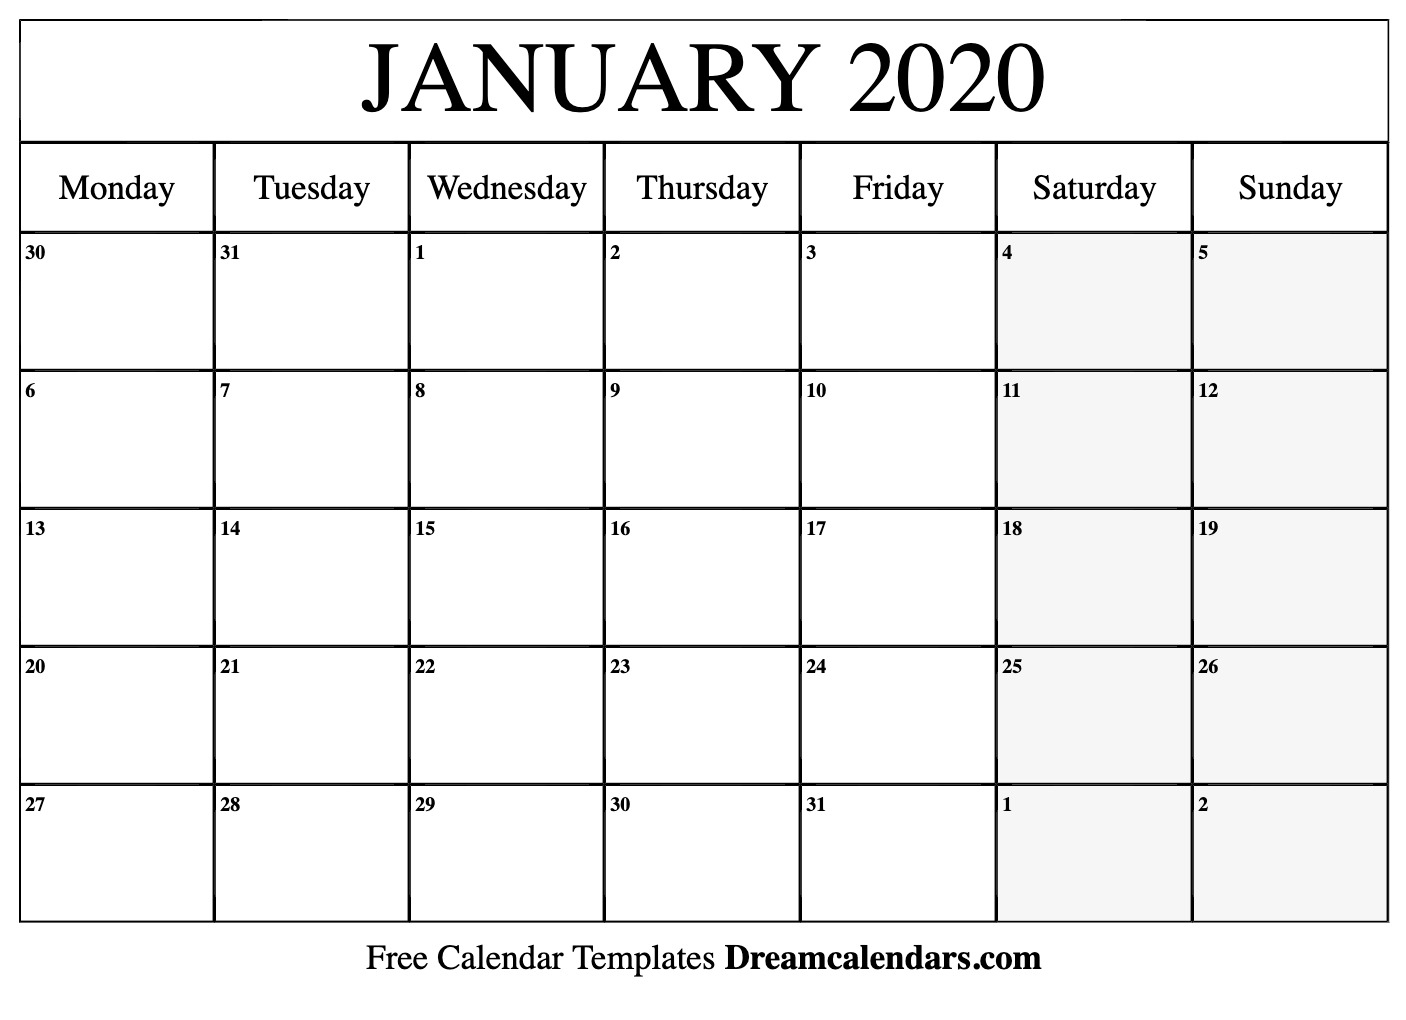 Dream Calendars - Make Your Calendar Template Blog for Monday Through Friday Calendar Template January Printable